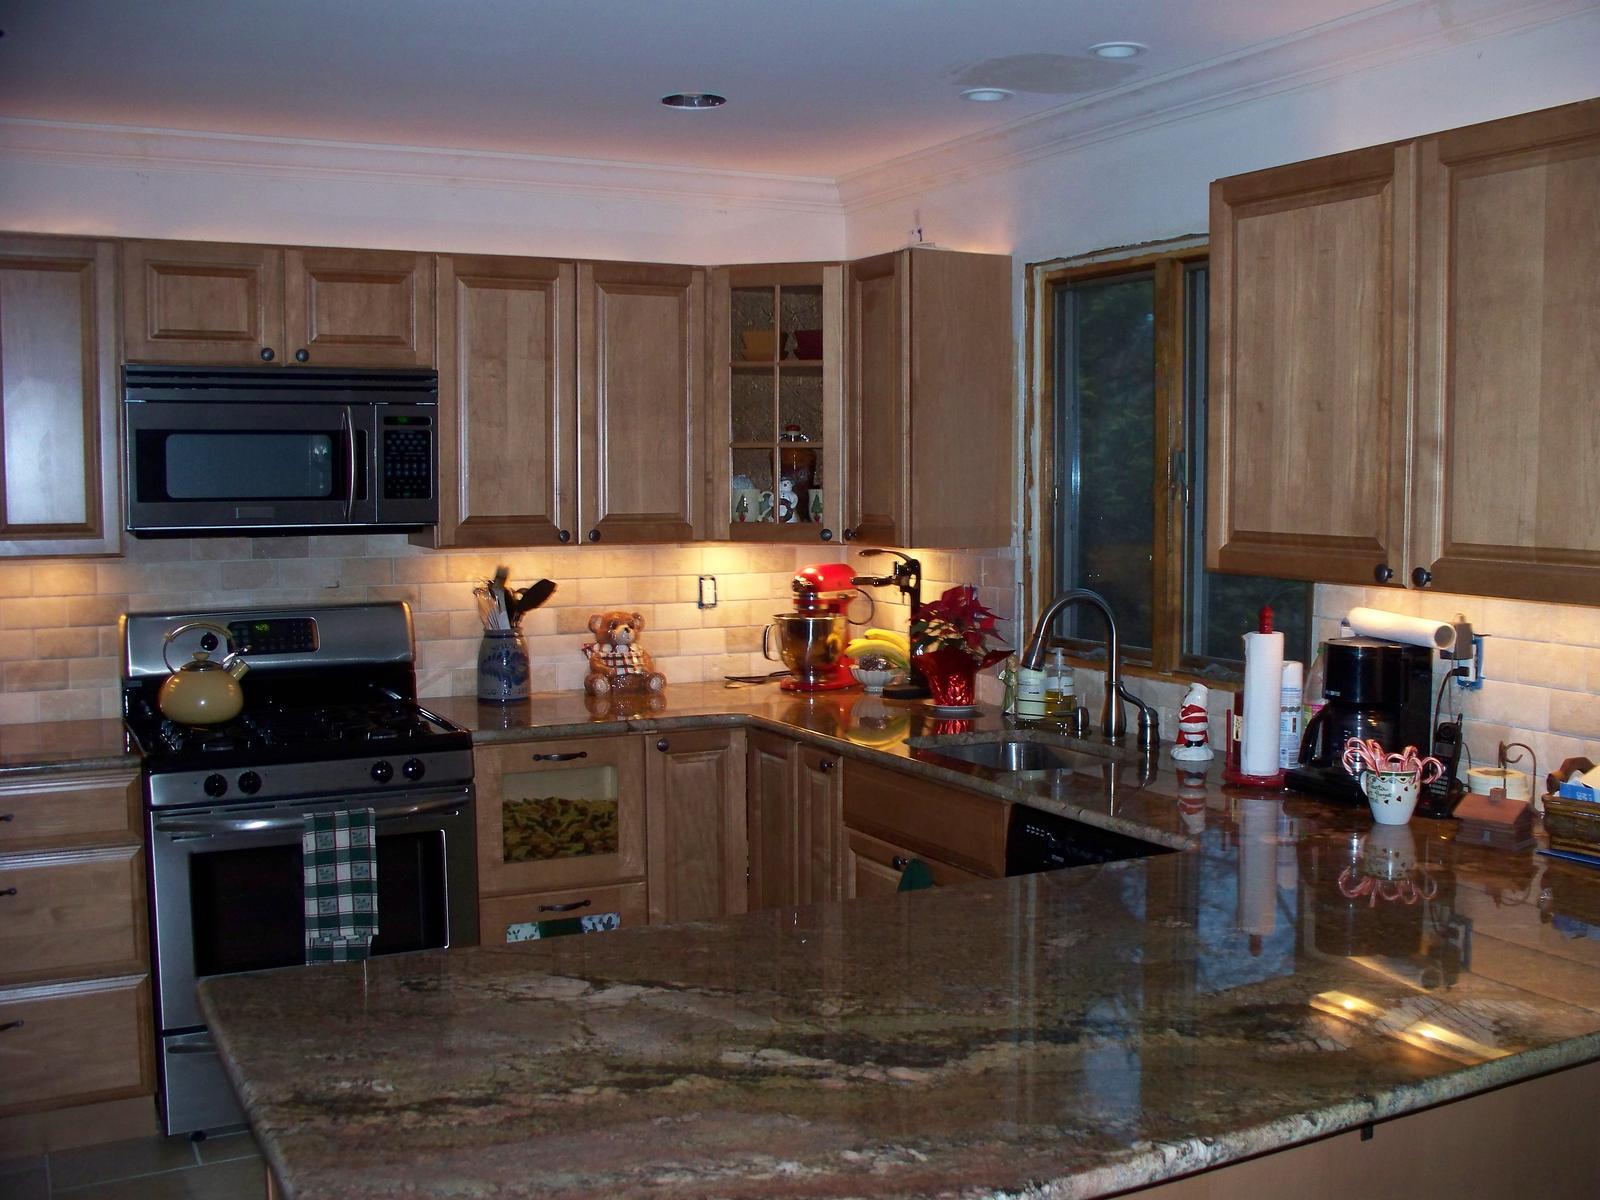 kitchen remodel ideas for modern kitchen design vaulted ceiling